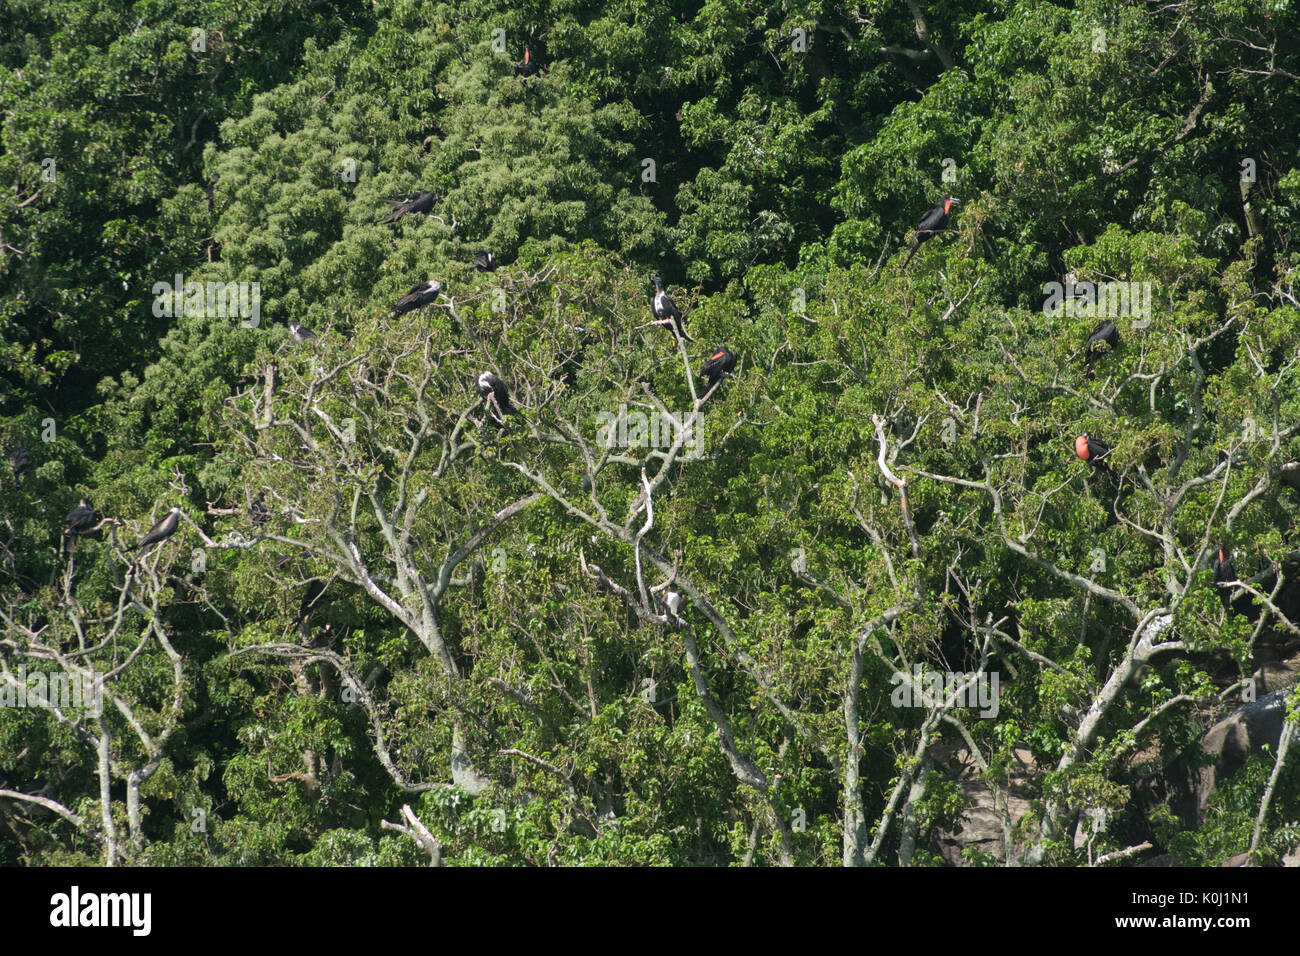 Seevögel an Bäumen auf 'Ilha da Queimada Grande' Insel, Sao Paulo State Ufer, Brasilien Stockbild